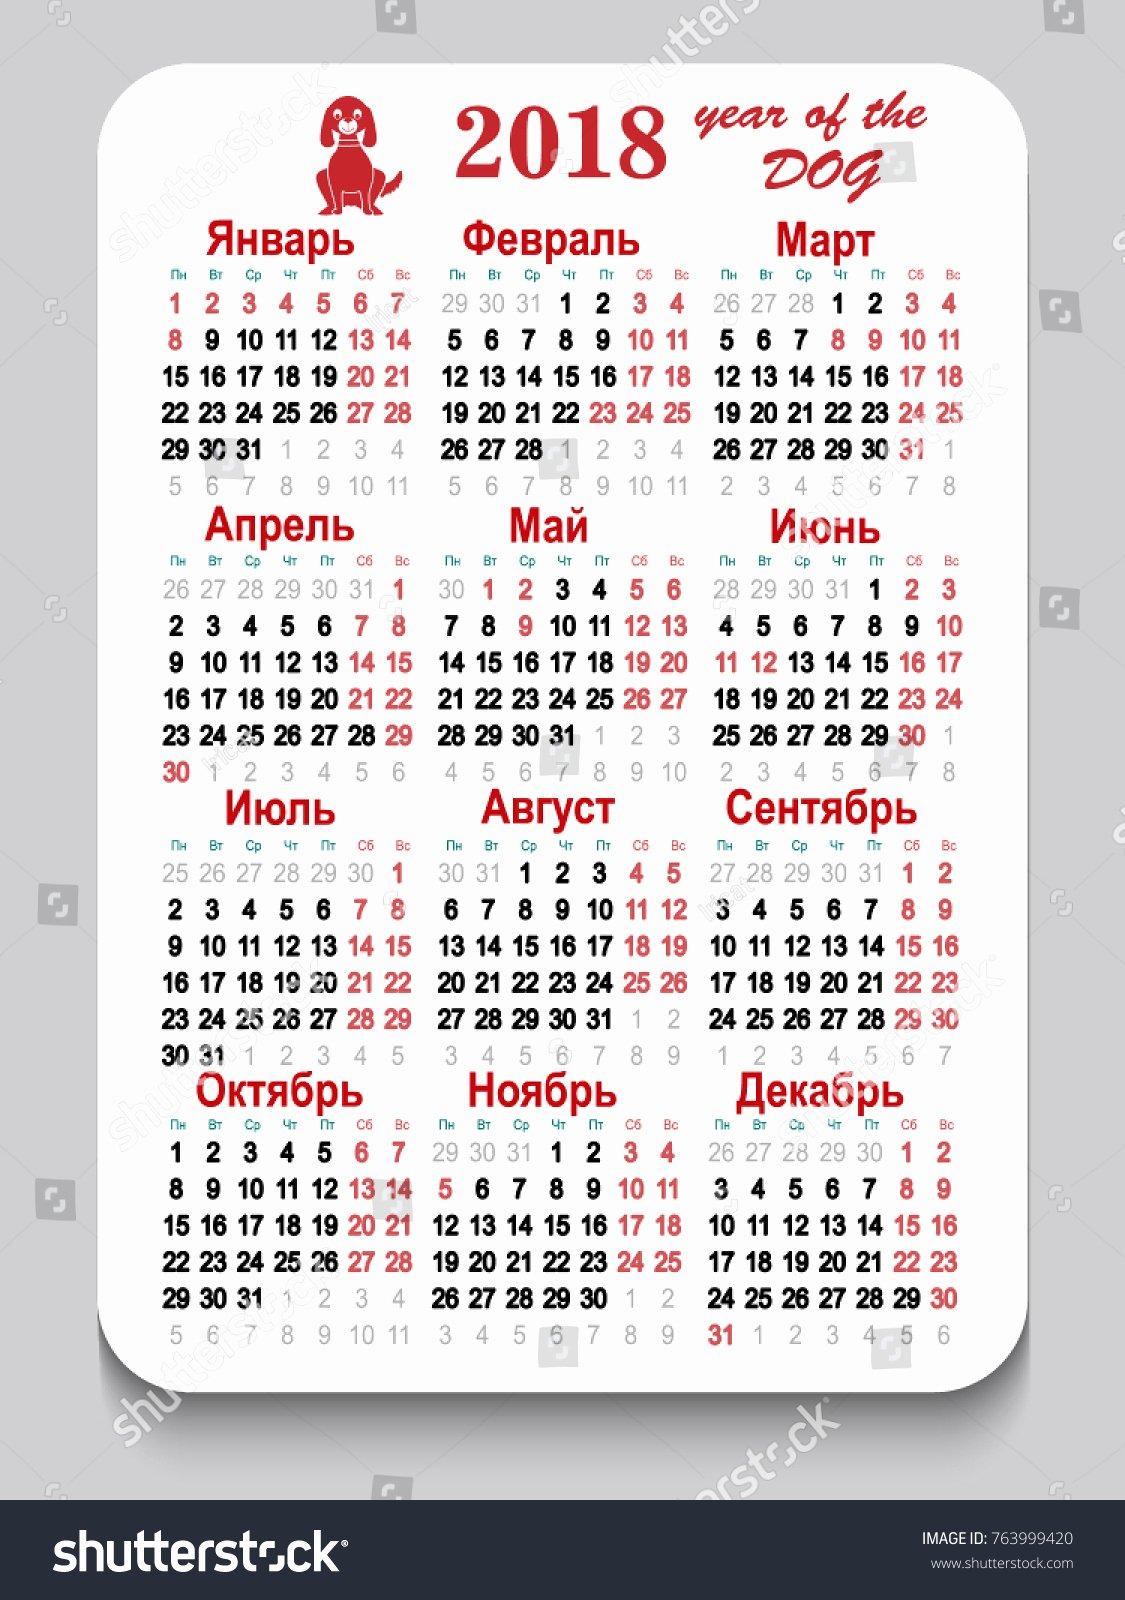 2018 Pocket Calendar Free Download Your Calendar Guy